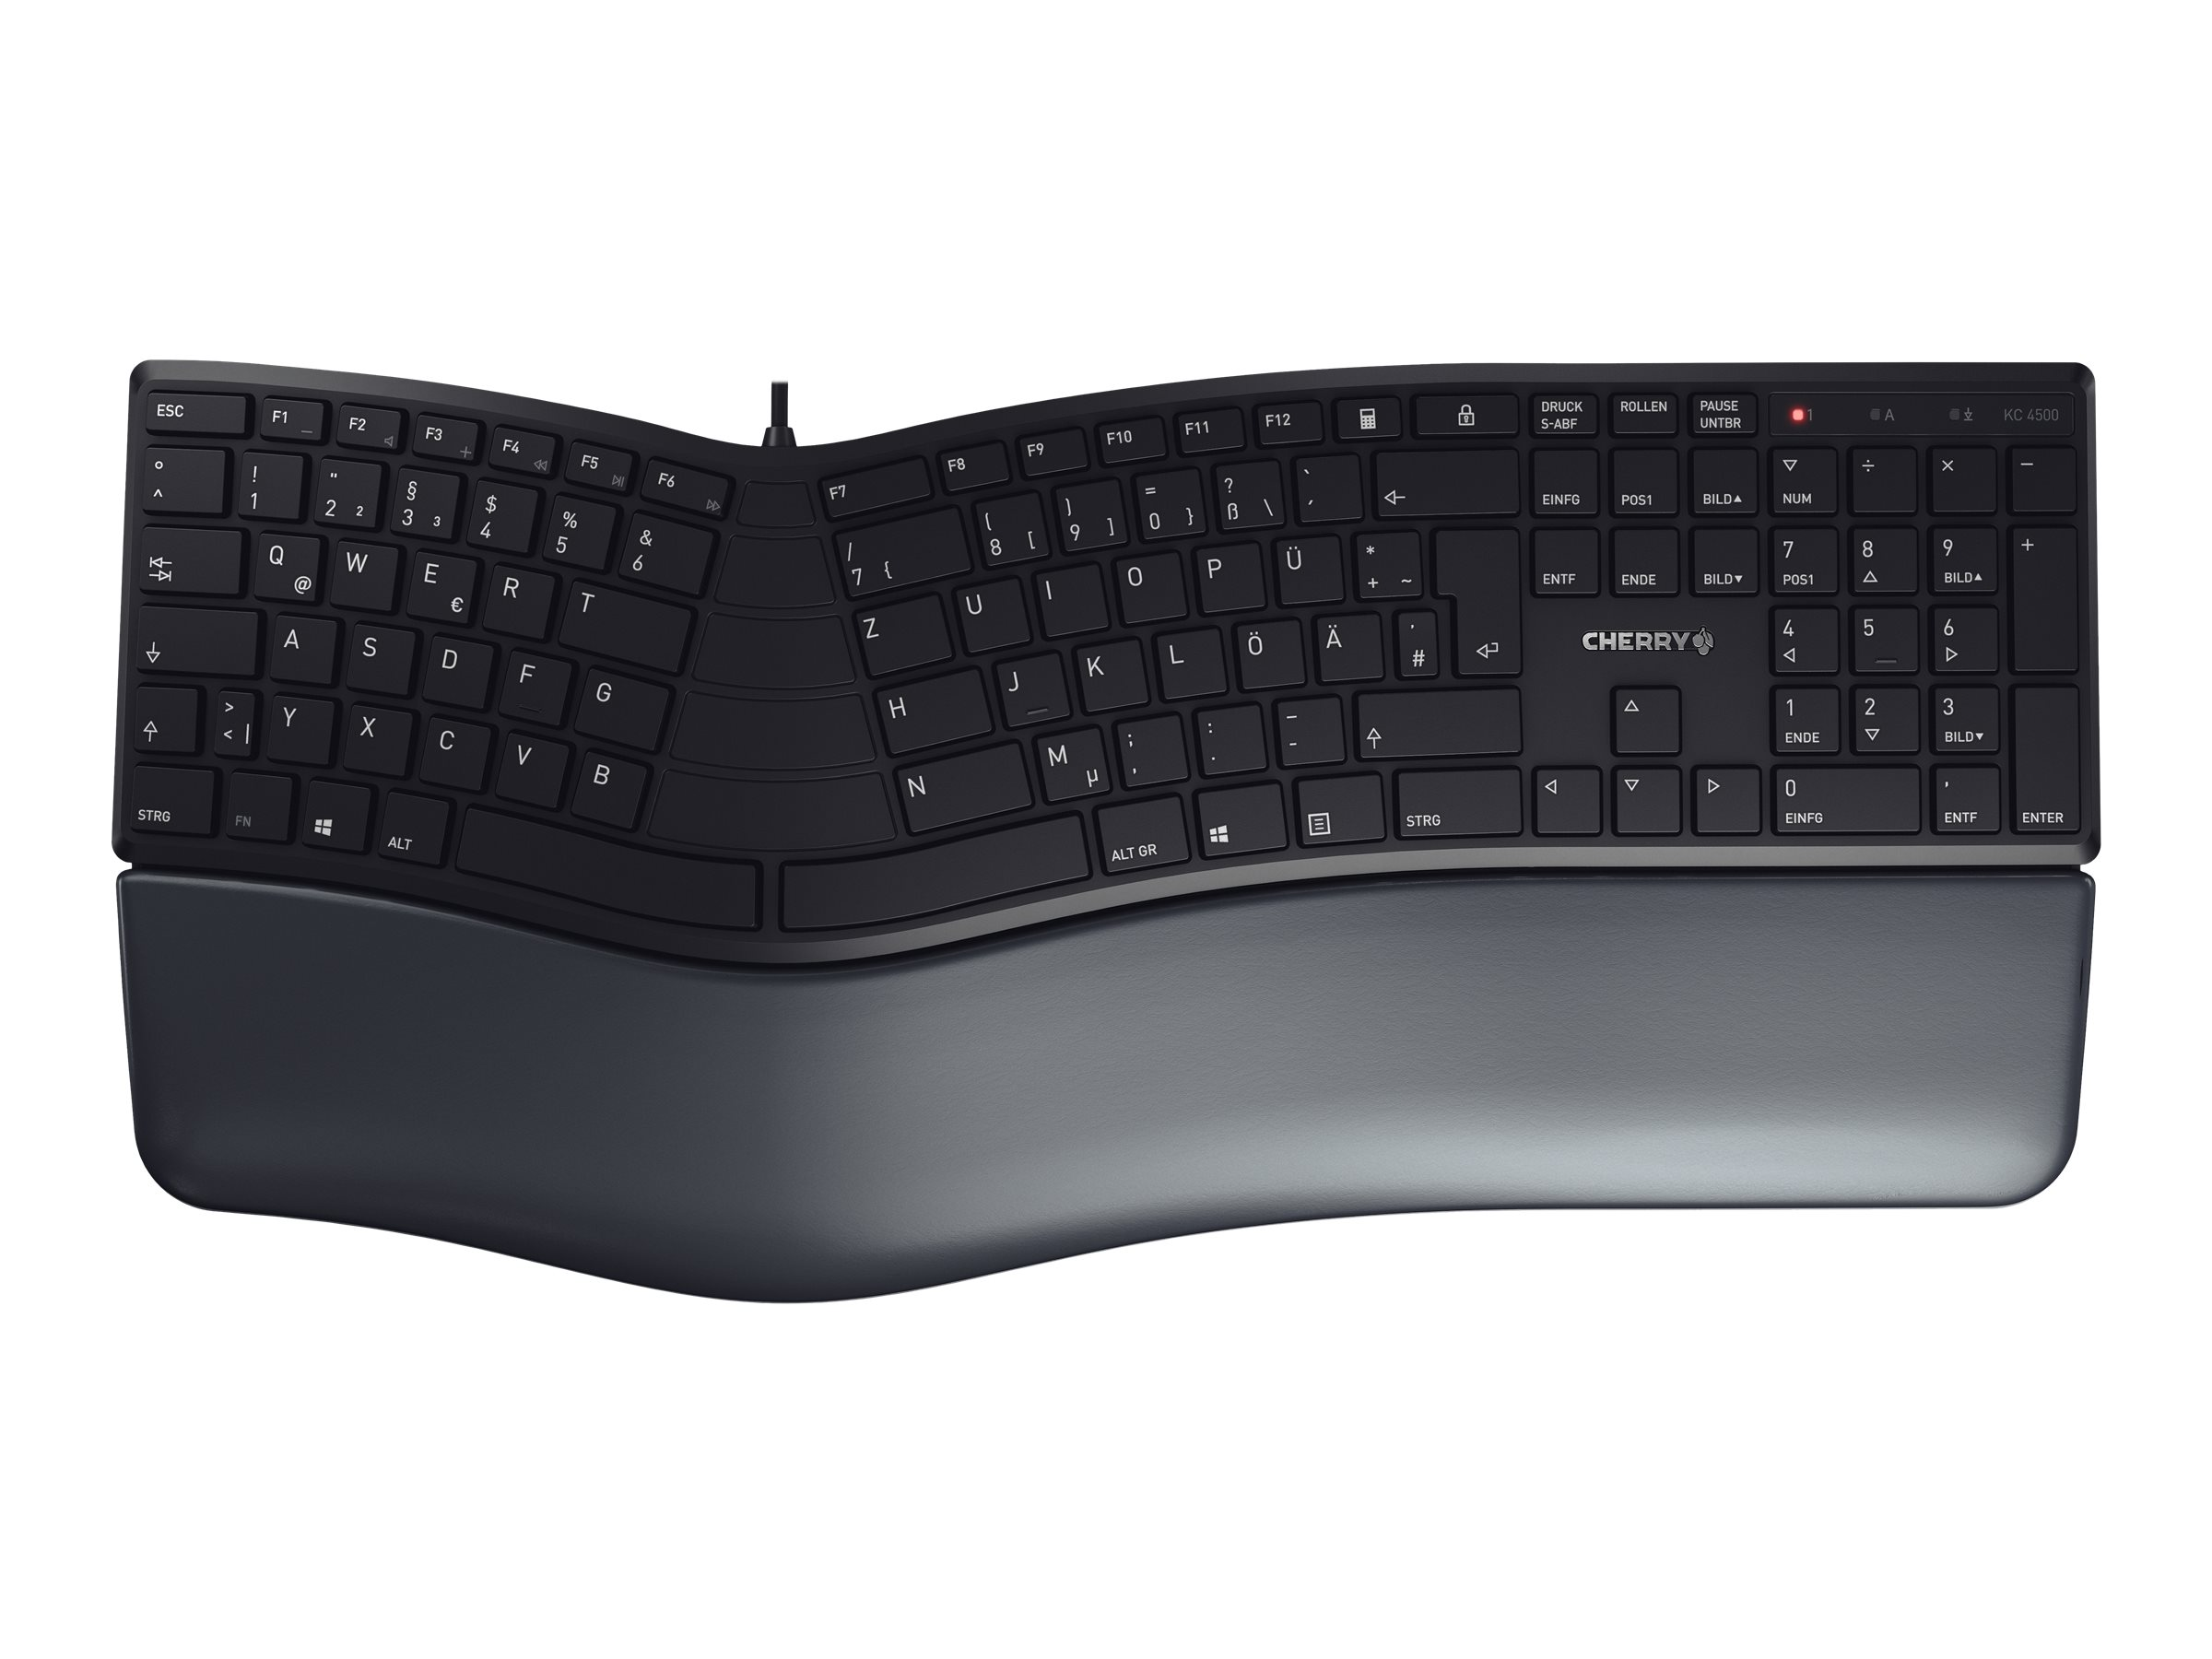 Cherry KC 4500 ERGO - Tastatur - USB - QWERTZ